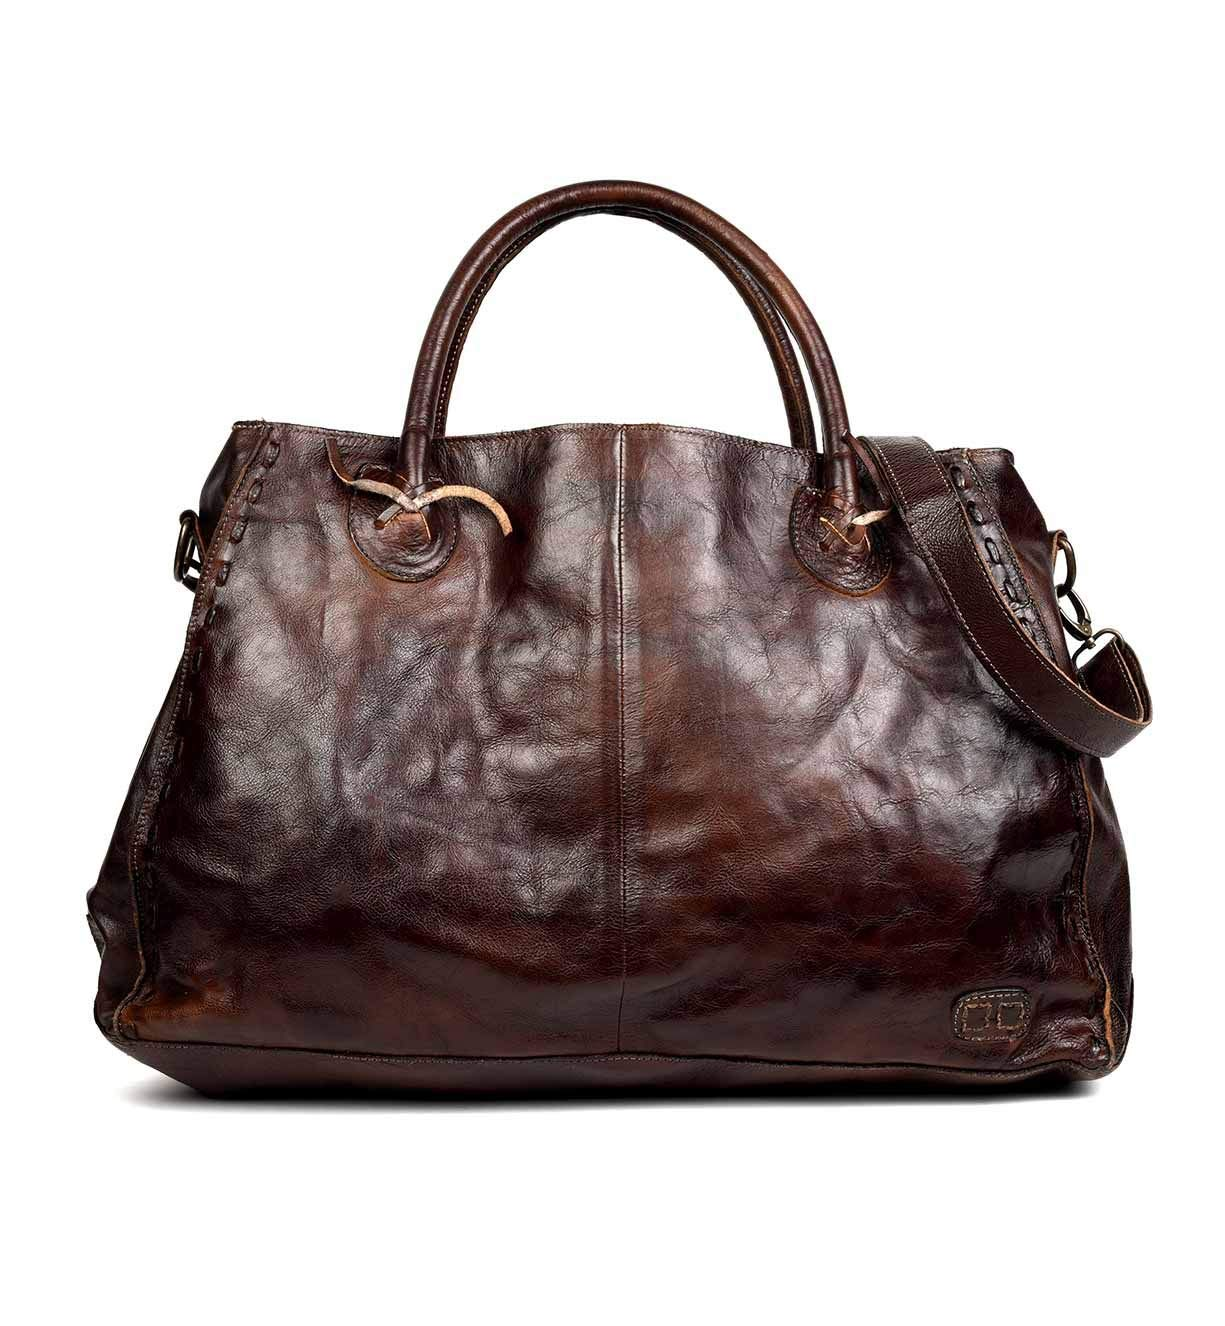 Bed|Stu Women's Rockaway Leather Bag (Teak Rustic)